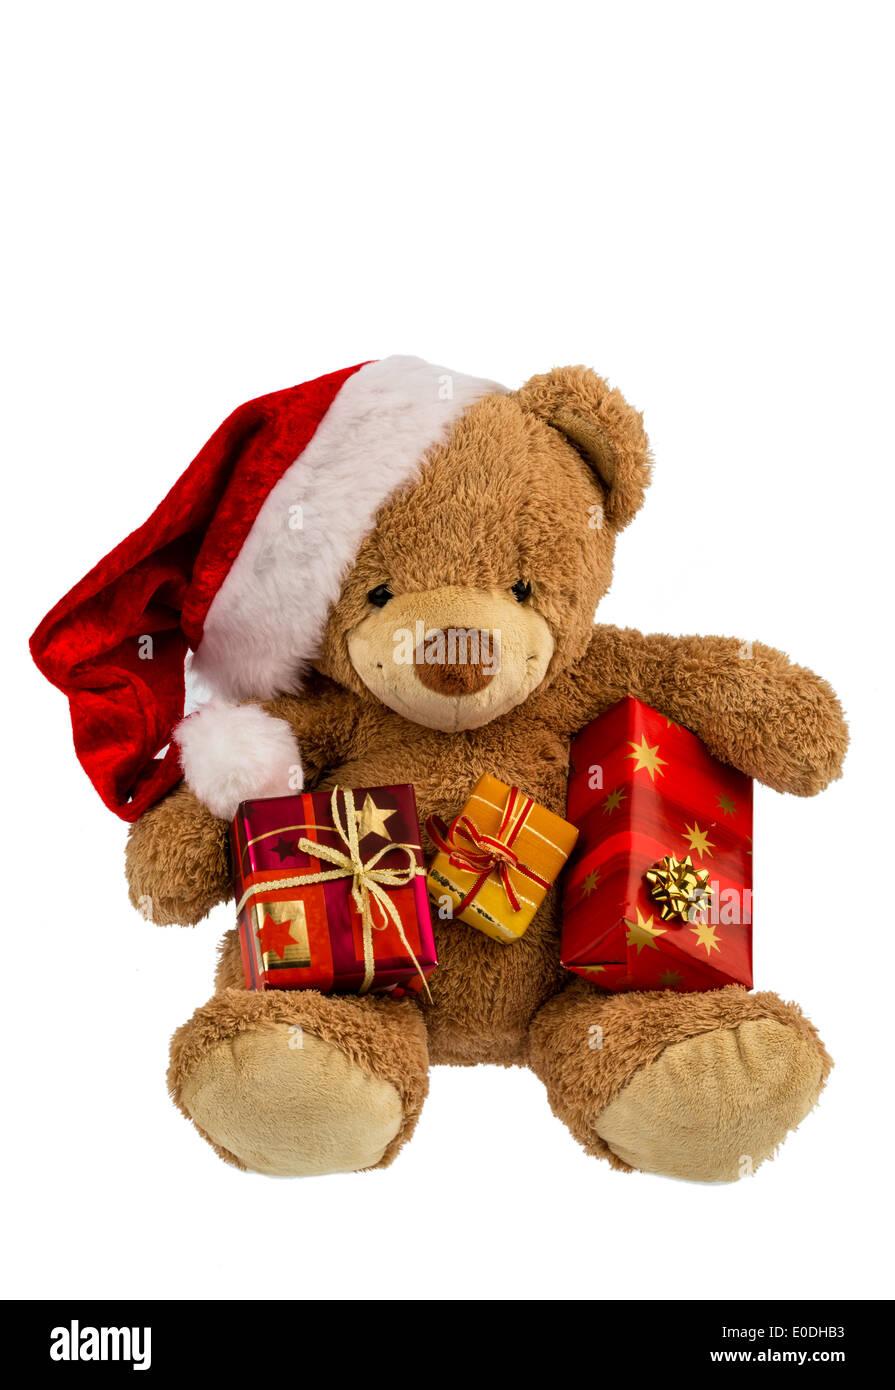 Un oso de peluche con regalos en Navidad. Cuando Santa Claus se viste de fiesta., Ein Teddybaer mit Geschenken zu Weihnachten. Weihnach als Foto de stock